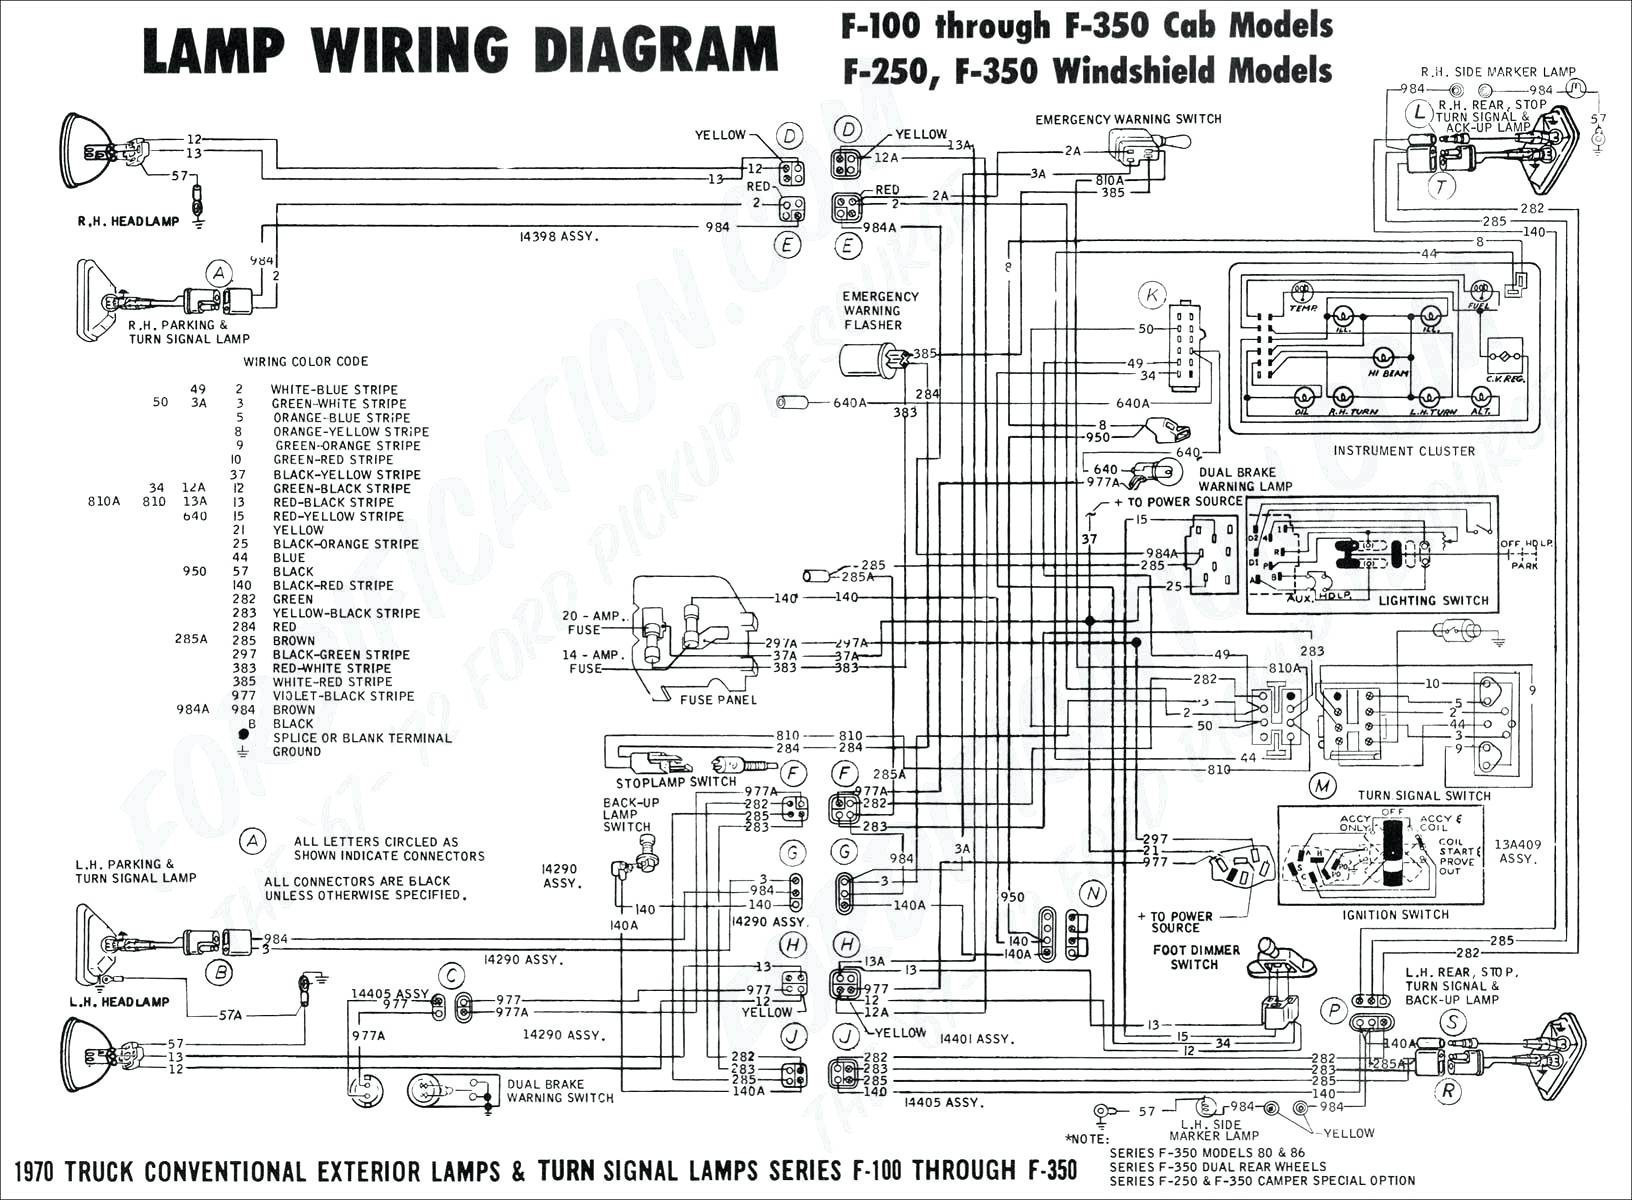 700R4 Torque Converter Lockup Wiring Diagram | Best Wiring Library - 700R4 Torque Converter Lockup Wiring Diagram